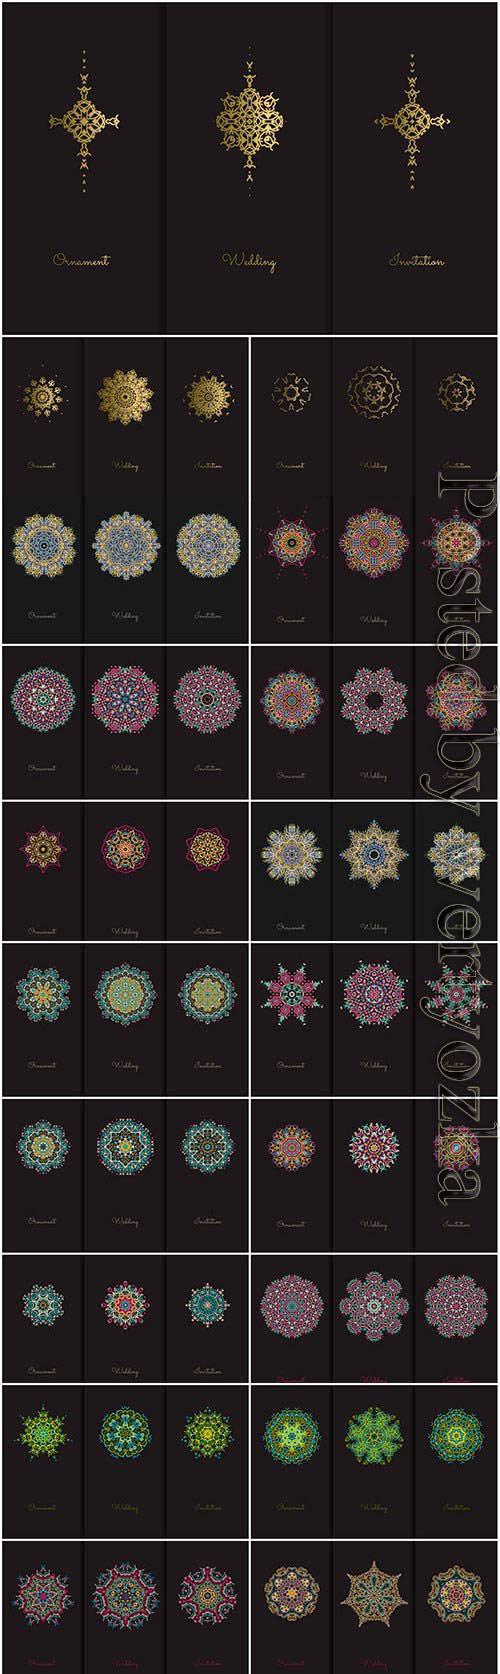 Mandala multicolored elements in vector